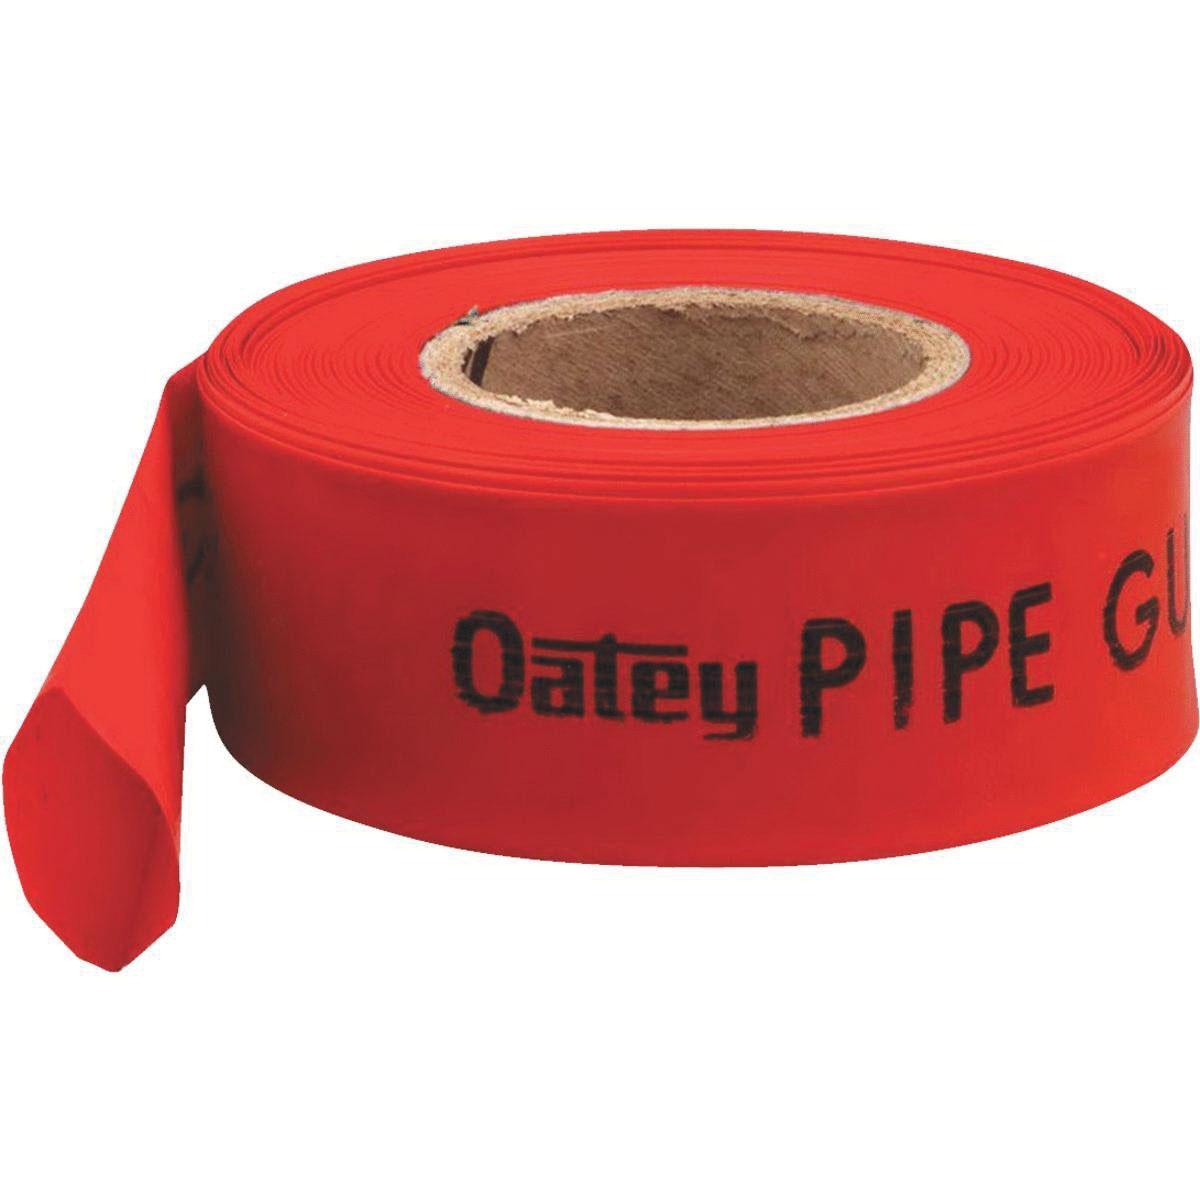 Oatey® 38707 Red Polyethylene Pipe Guard, 200 ft L